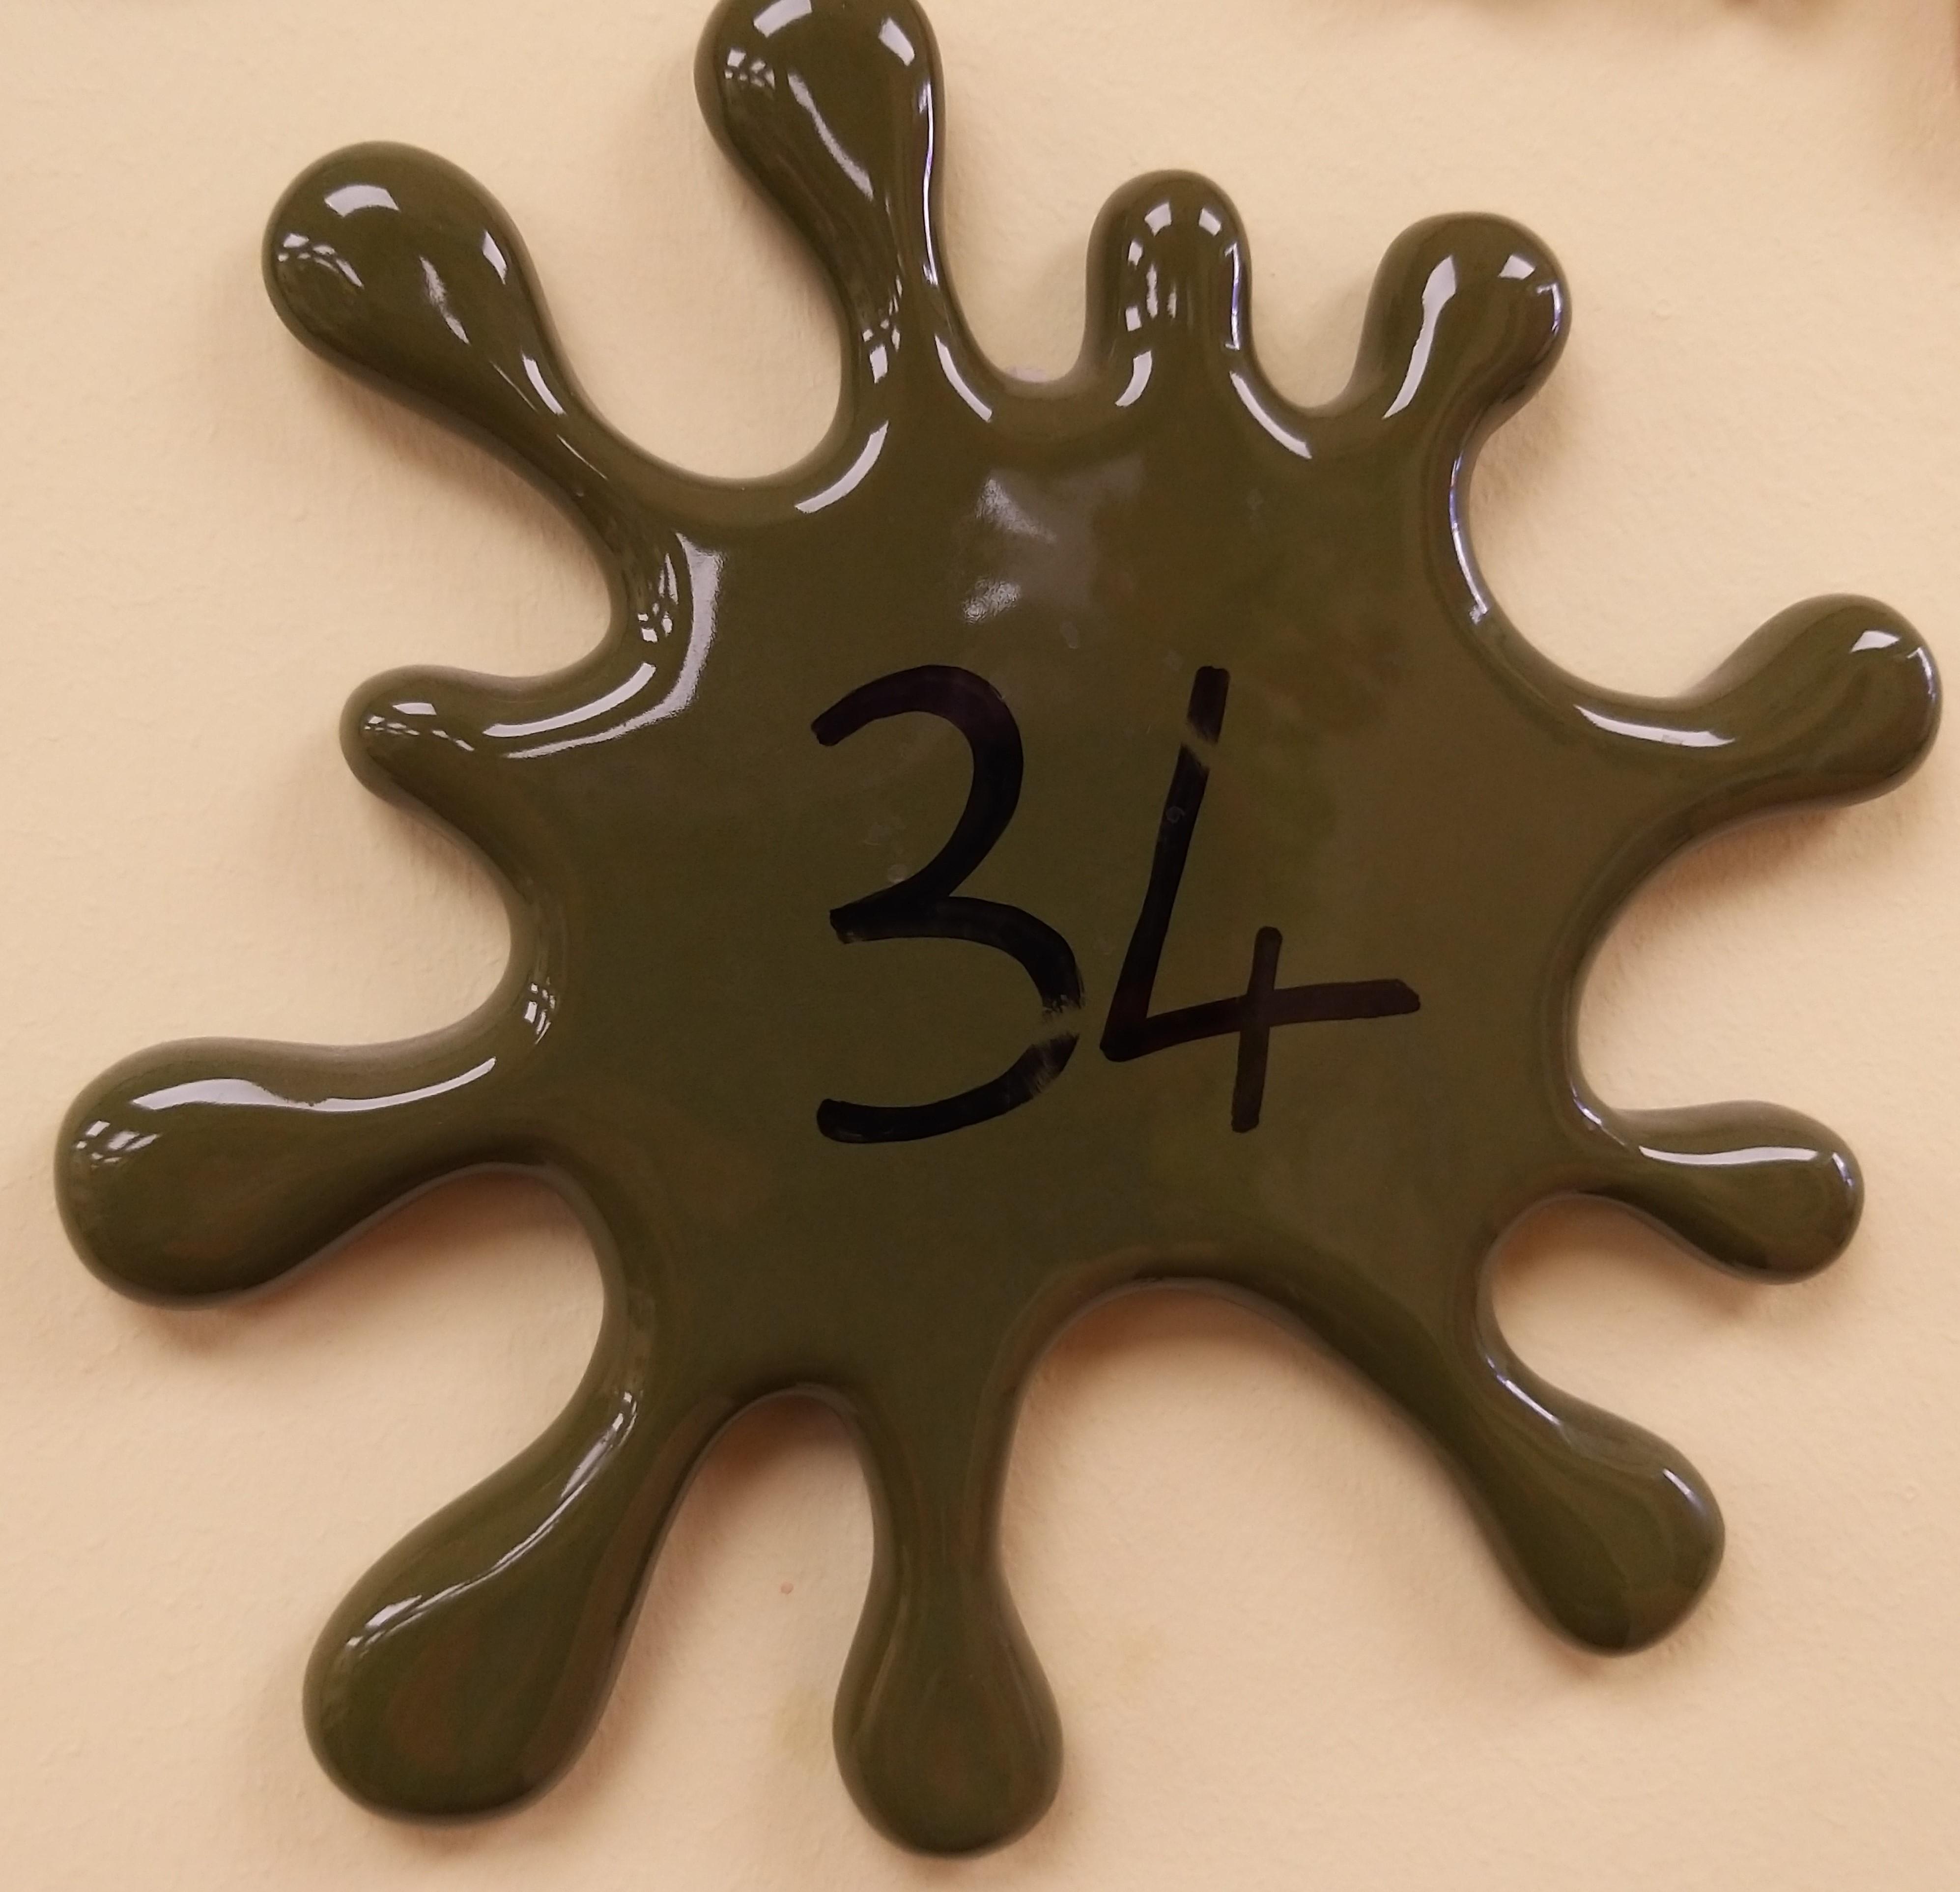 34. Khaki Green